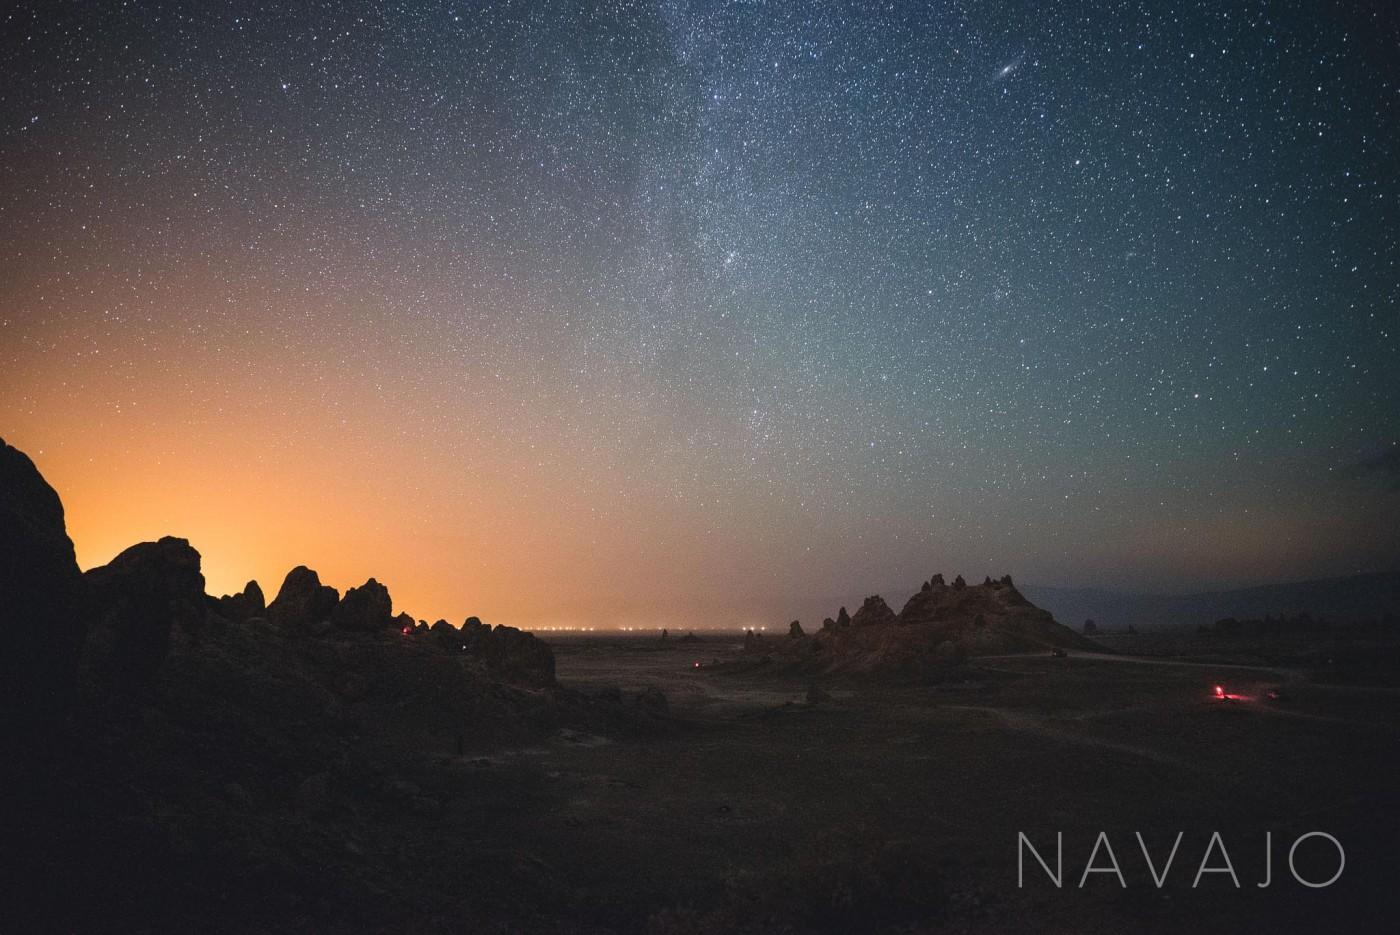 navajo-milky-way-astrophotography-lonely-speck-lightroom-preset-2